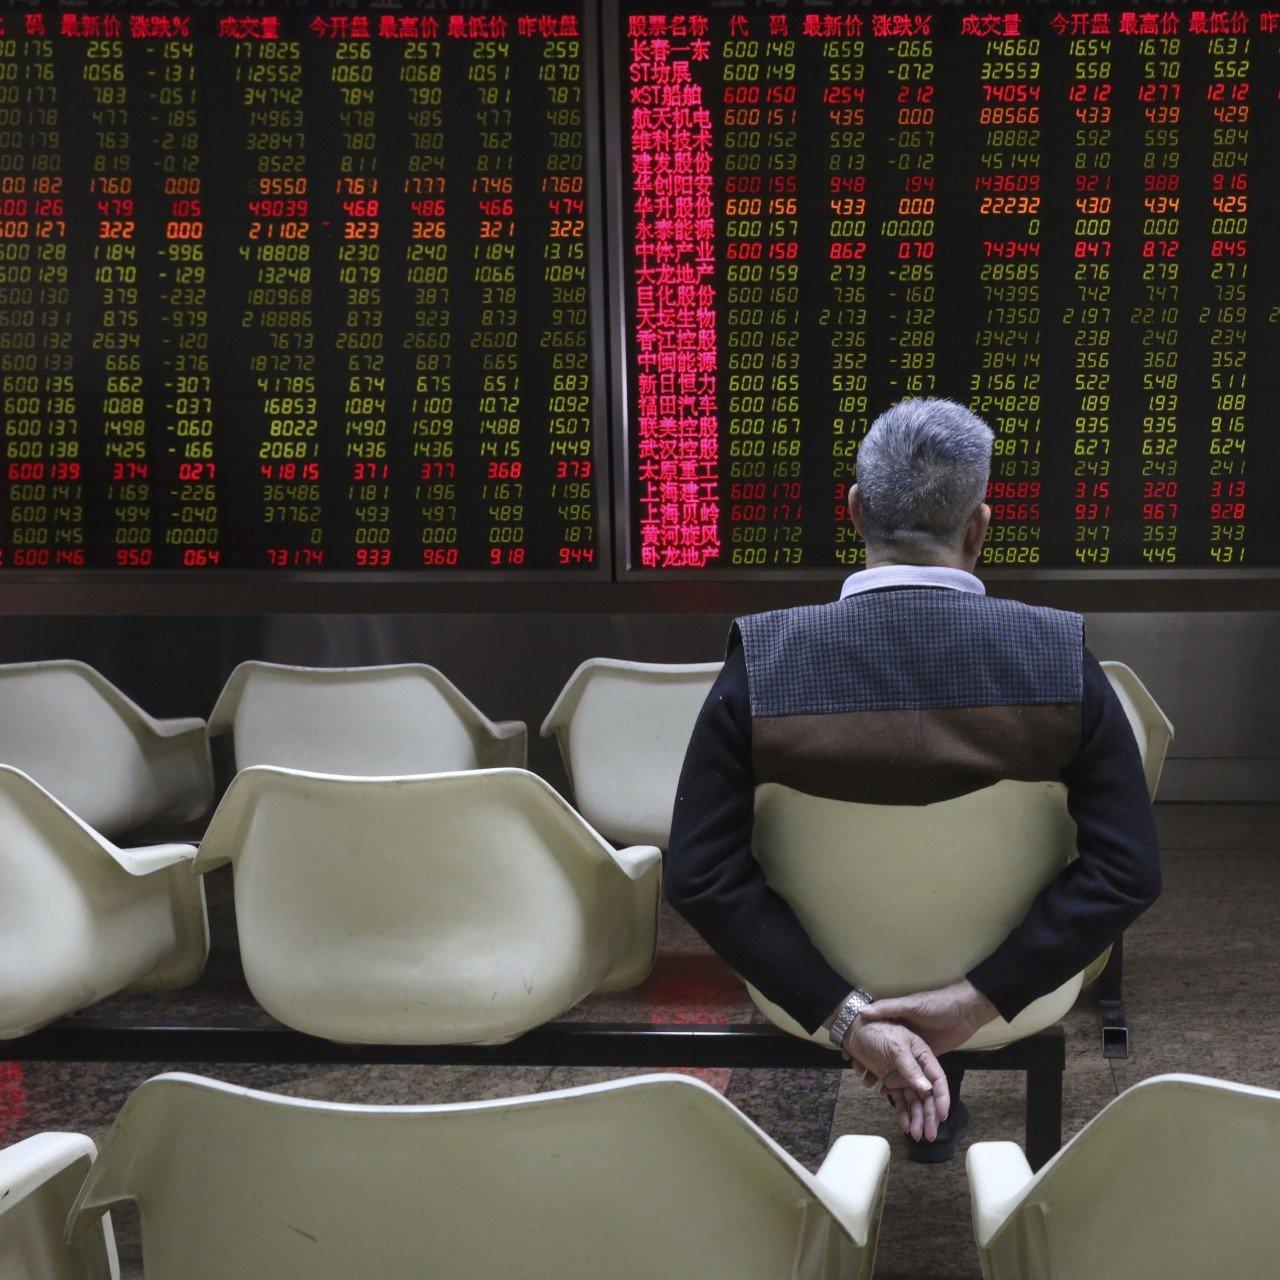 Mainland China stocks post slight gains on Thursday after